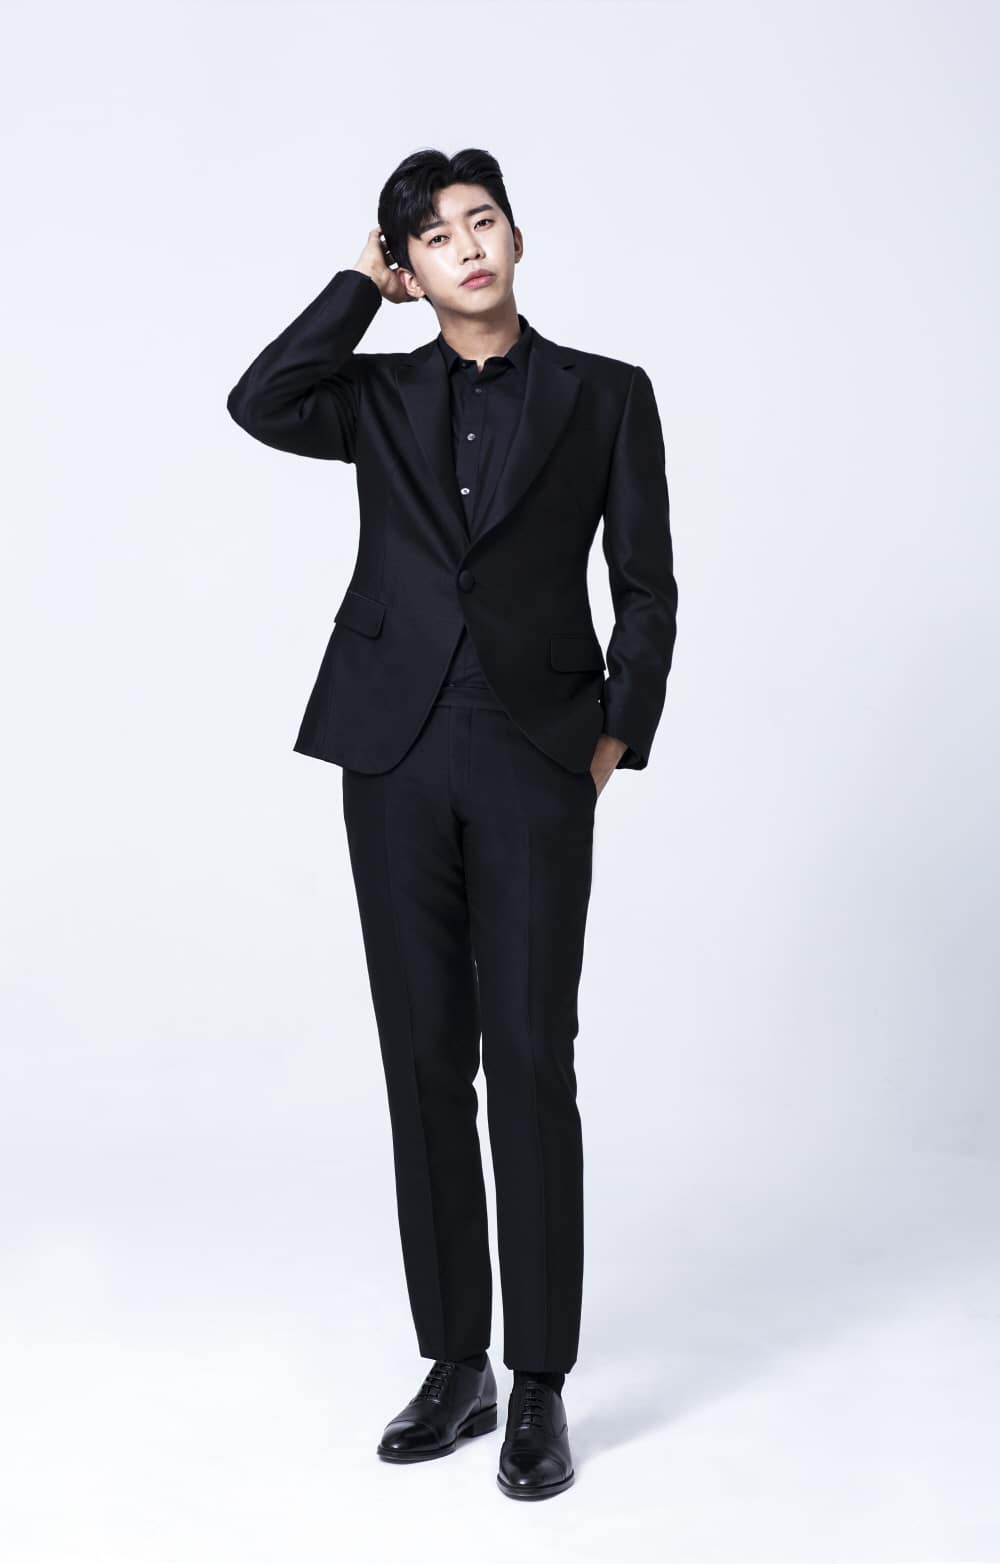 HYBEへの移籍が報じられたトロット歌手のイム・ヨンウン